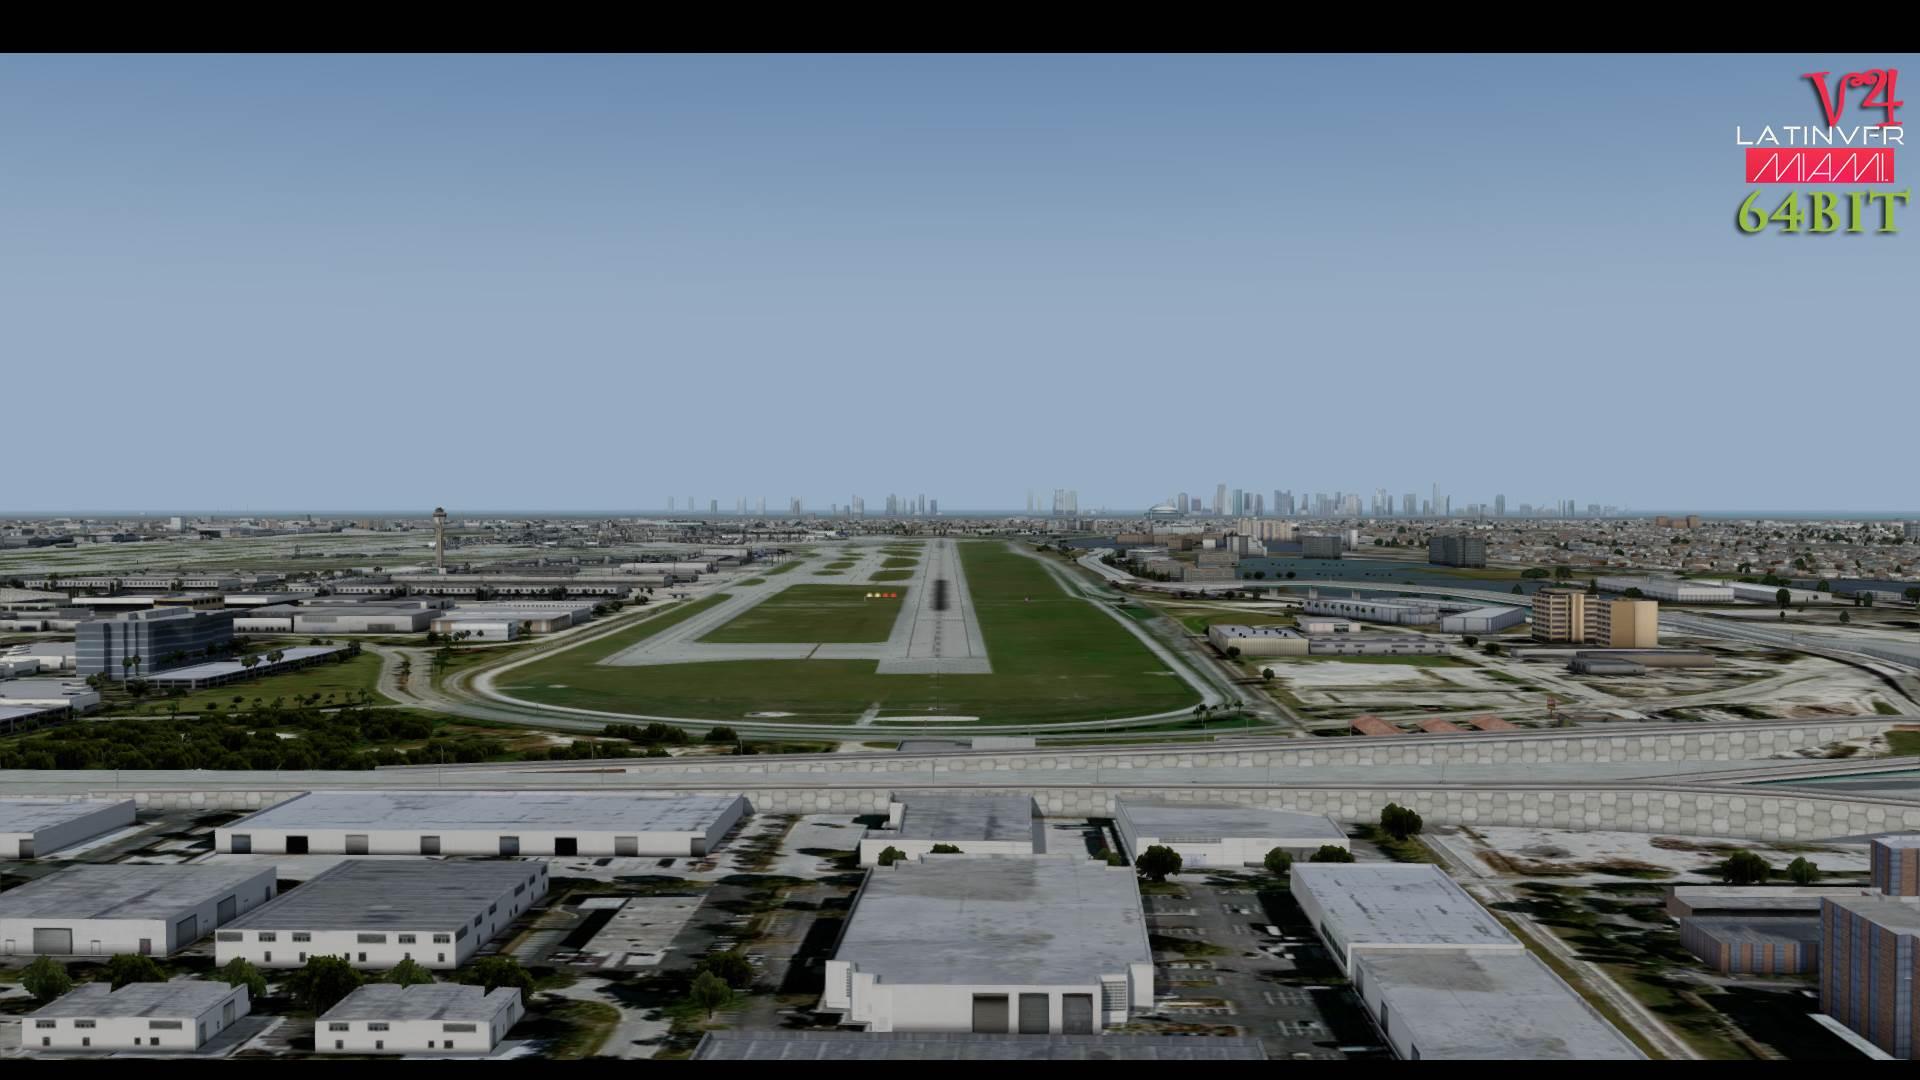 Airport Fsx Latinfr Kmia rar indir